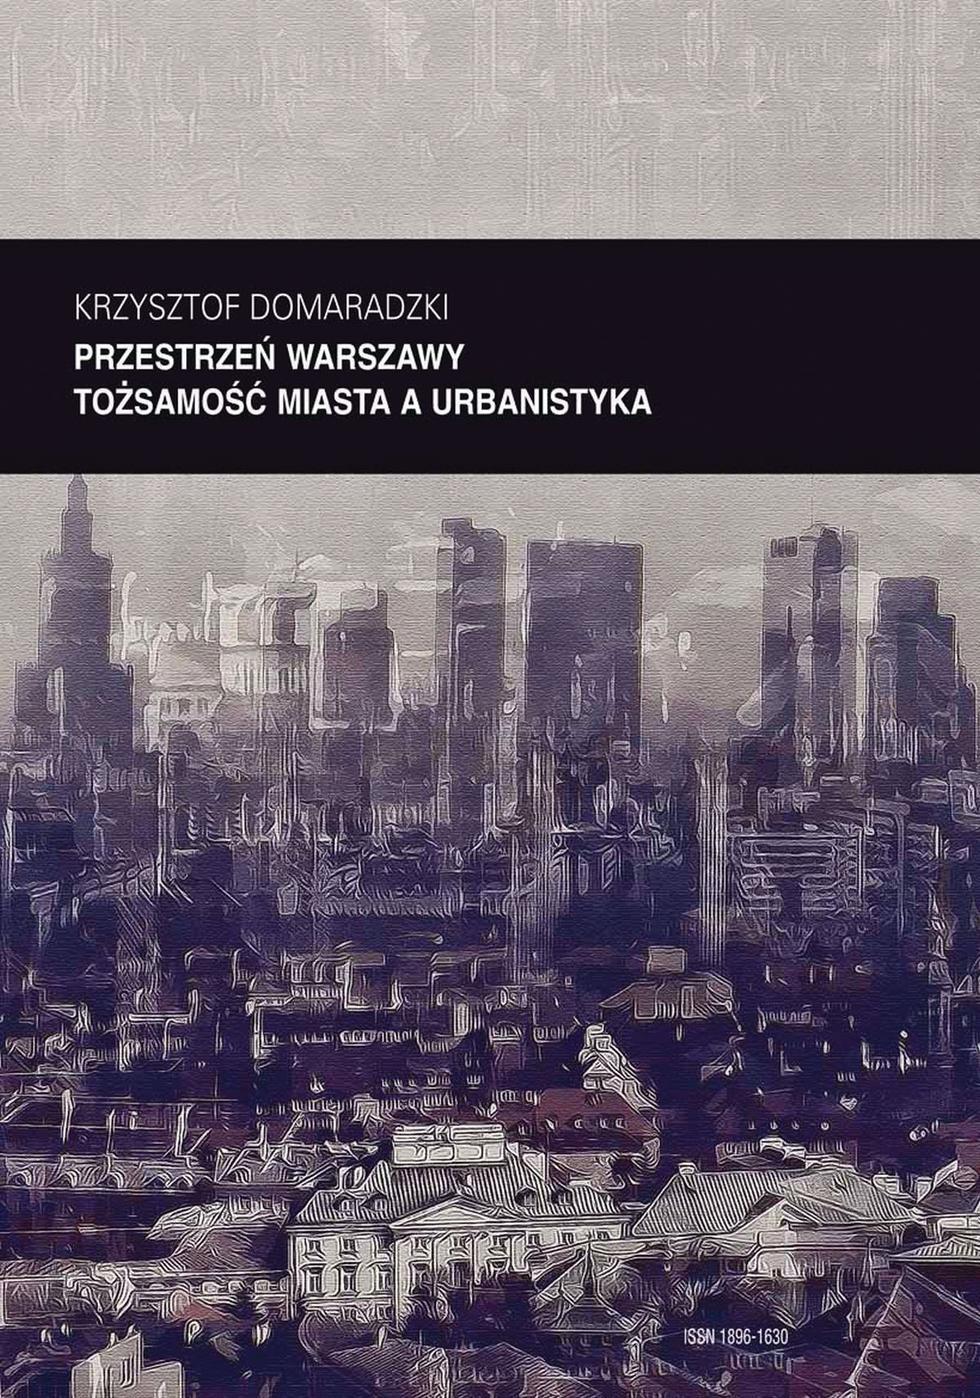 Tożsamość miasta